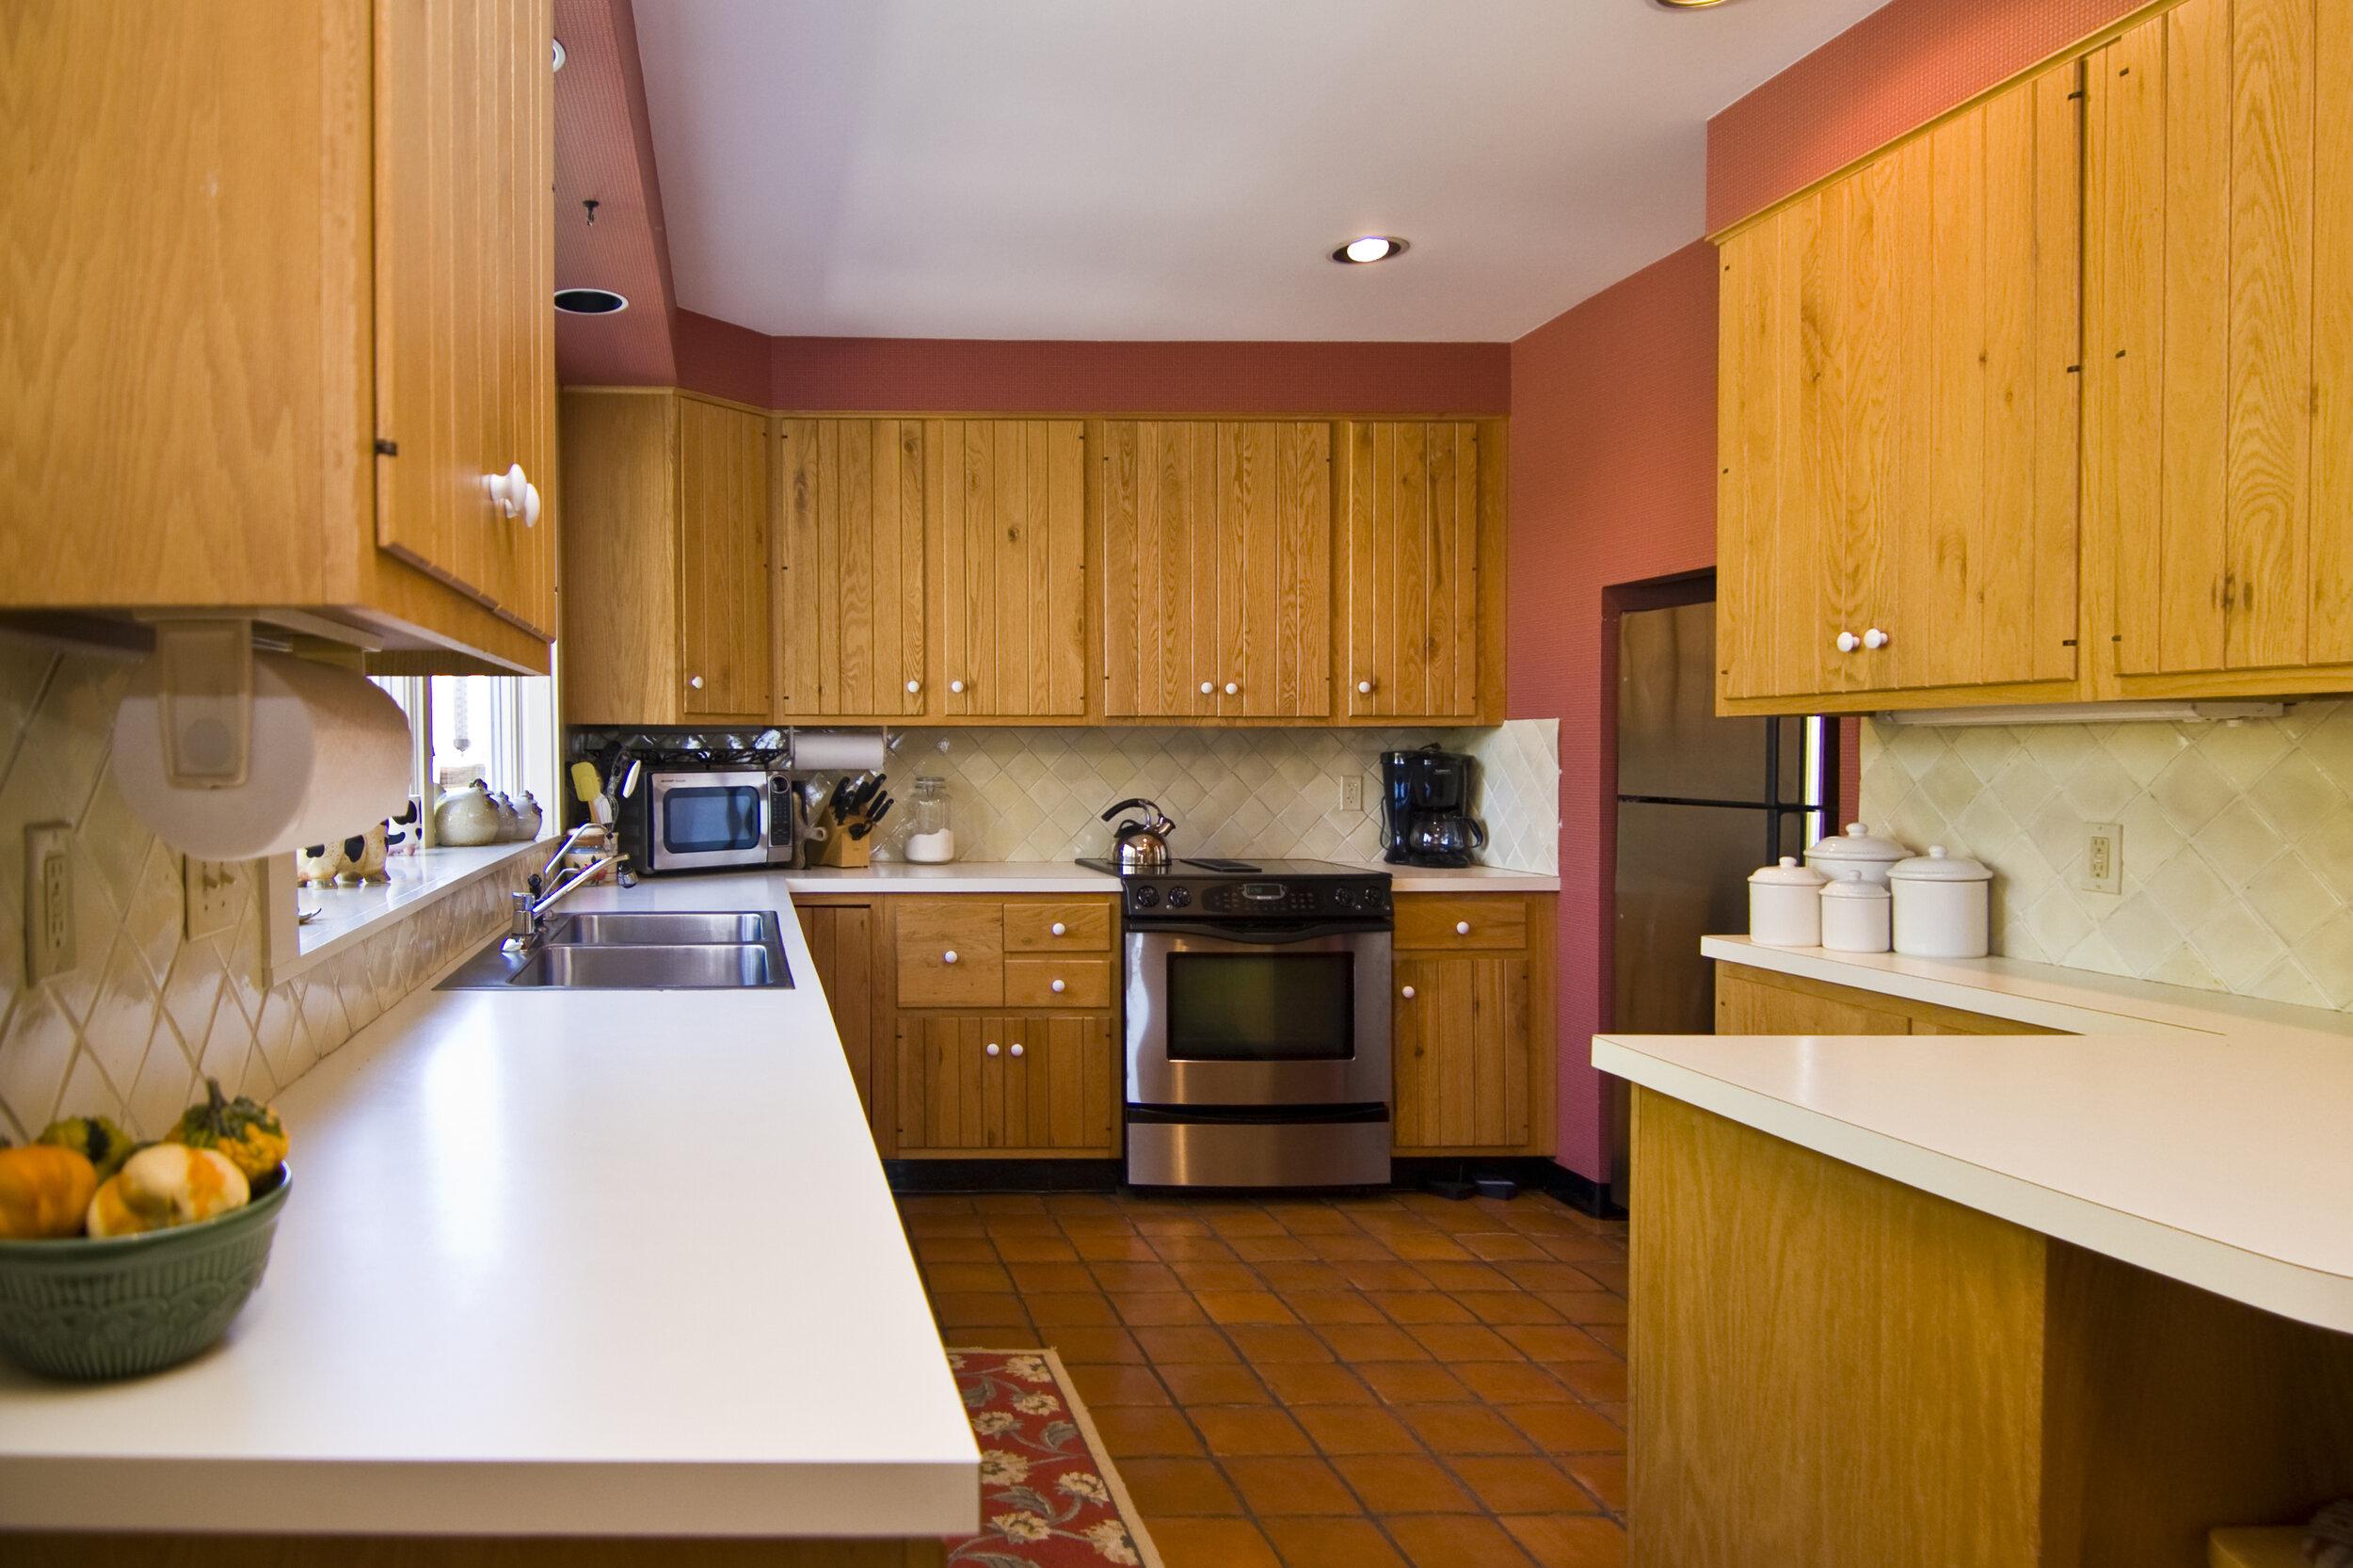 _MG_2940 Kole Kitchen DXO.jpg